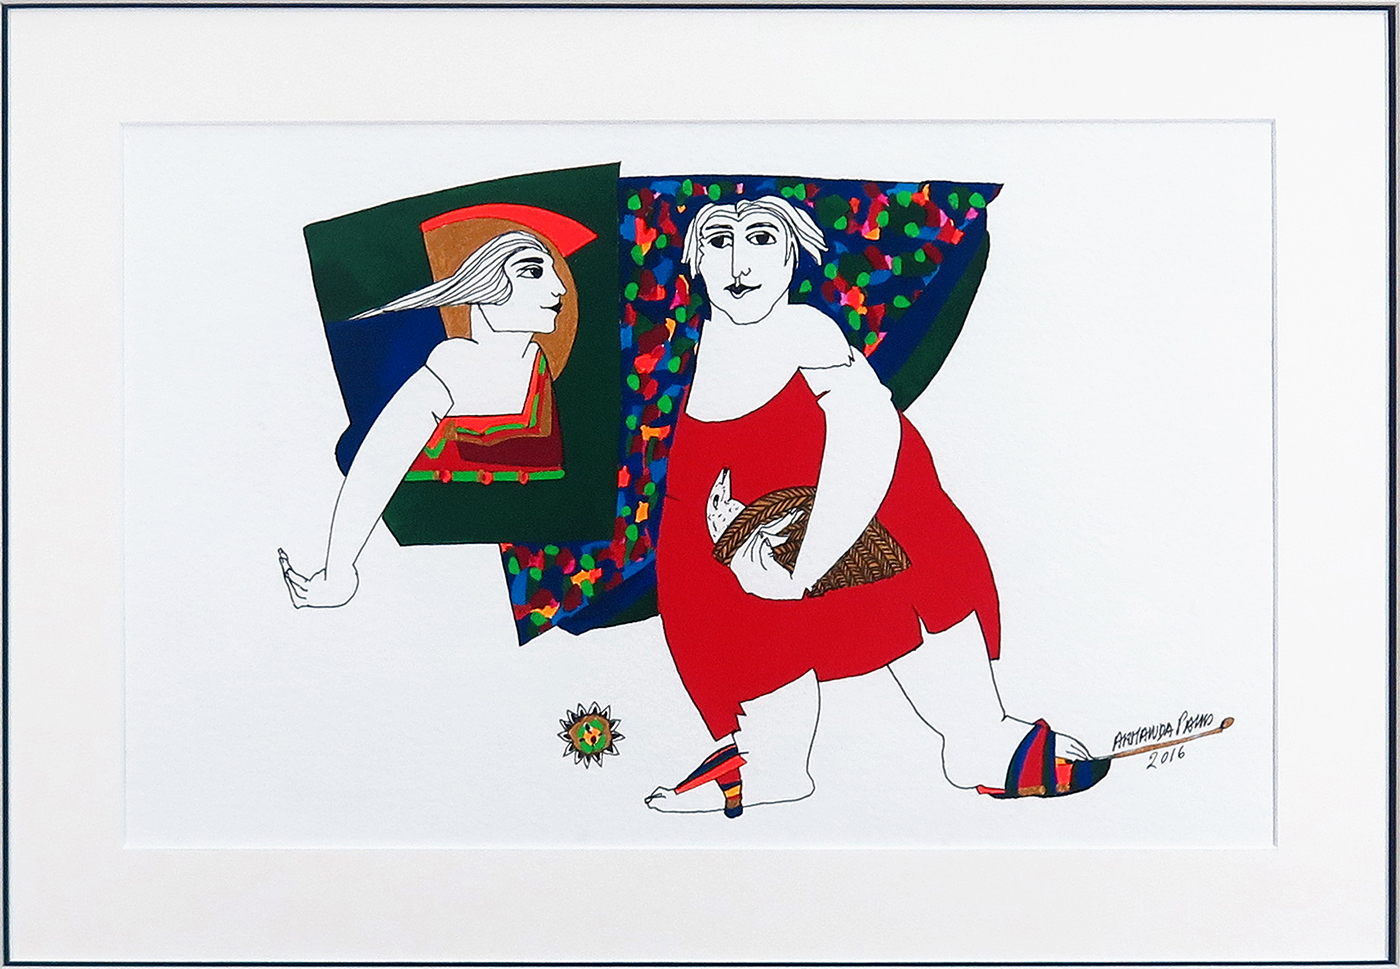 Sem título, guache sobre papel, 25,5 x 41 cm, 2016